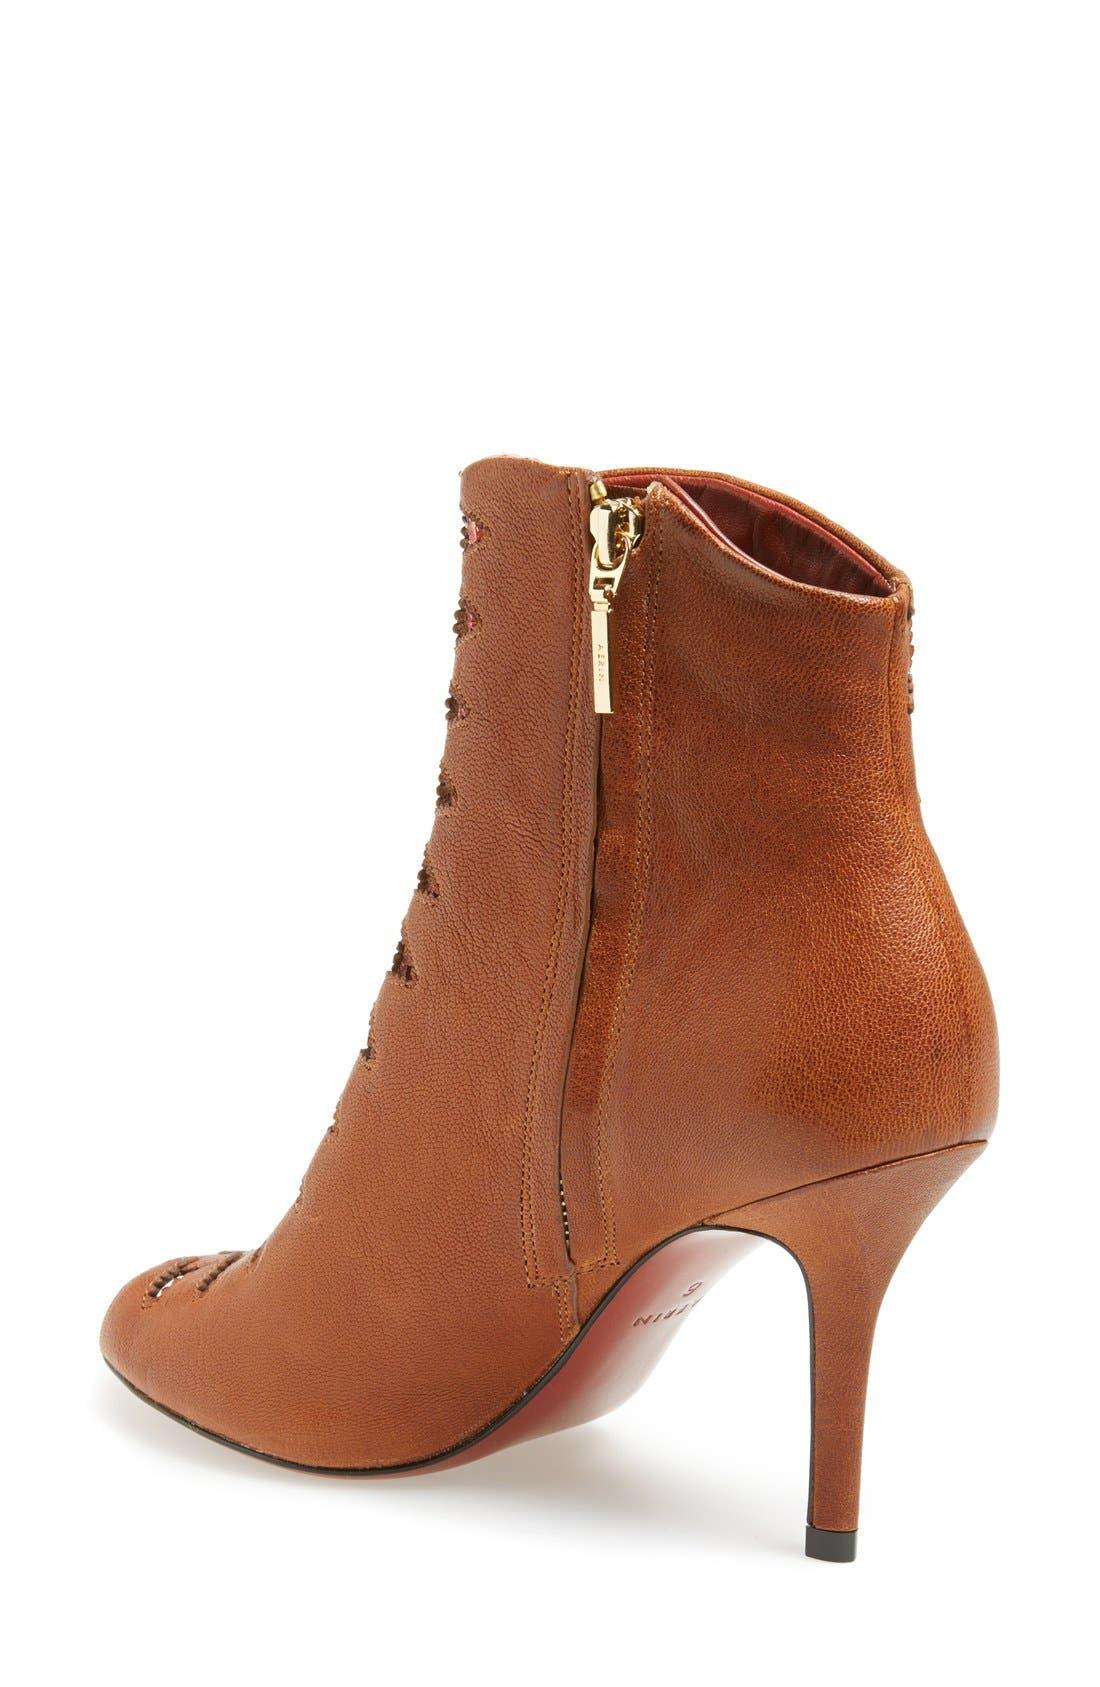 Alternate Image 2  - Aerin 'Carine' Peep Toe Leather Bootie (Women)